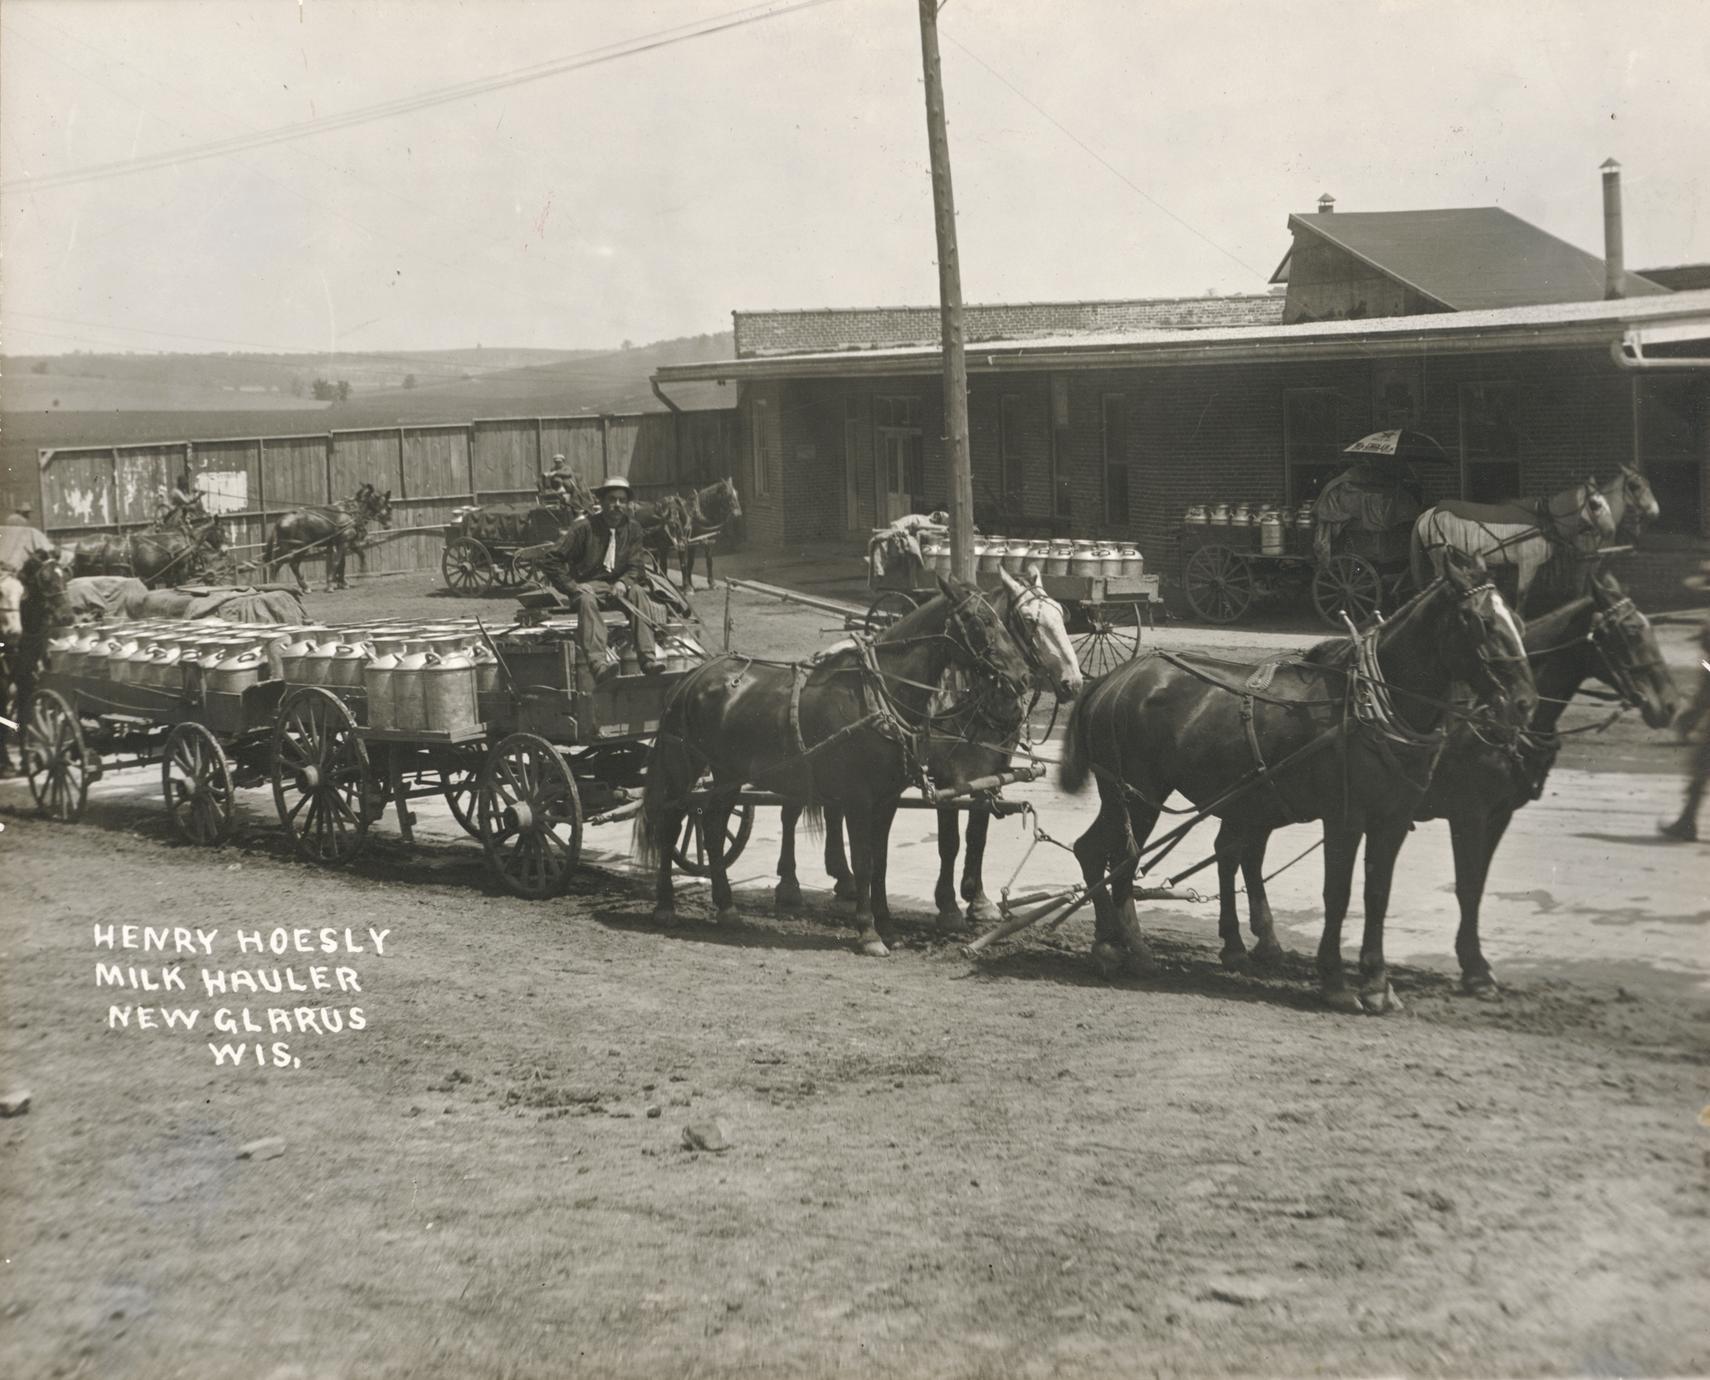 Henry Hoesly, milk hauler